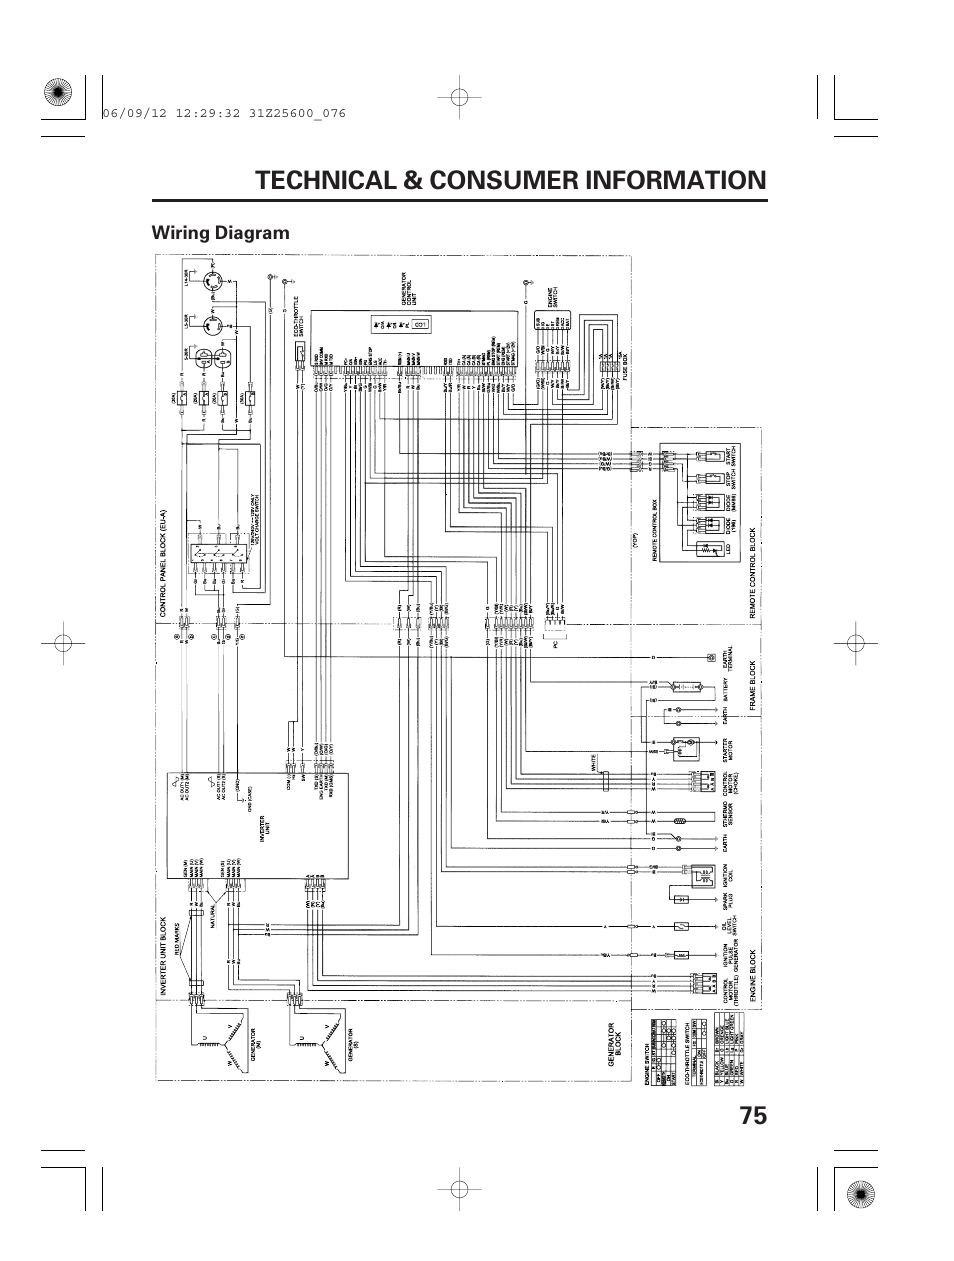 wiring diagram 75 technical consumer information honda eu6500is rh manualsdir com karcher 620m wiring diagram karcher 520 wiring diagram